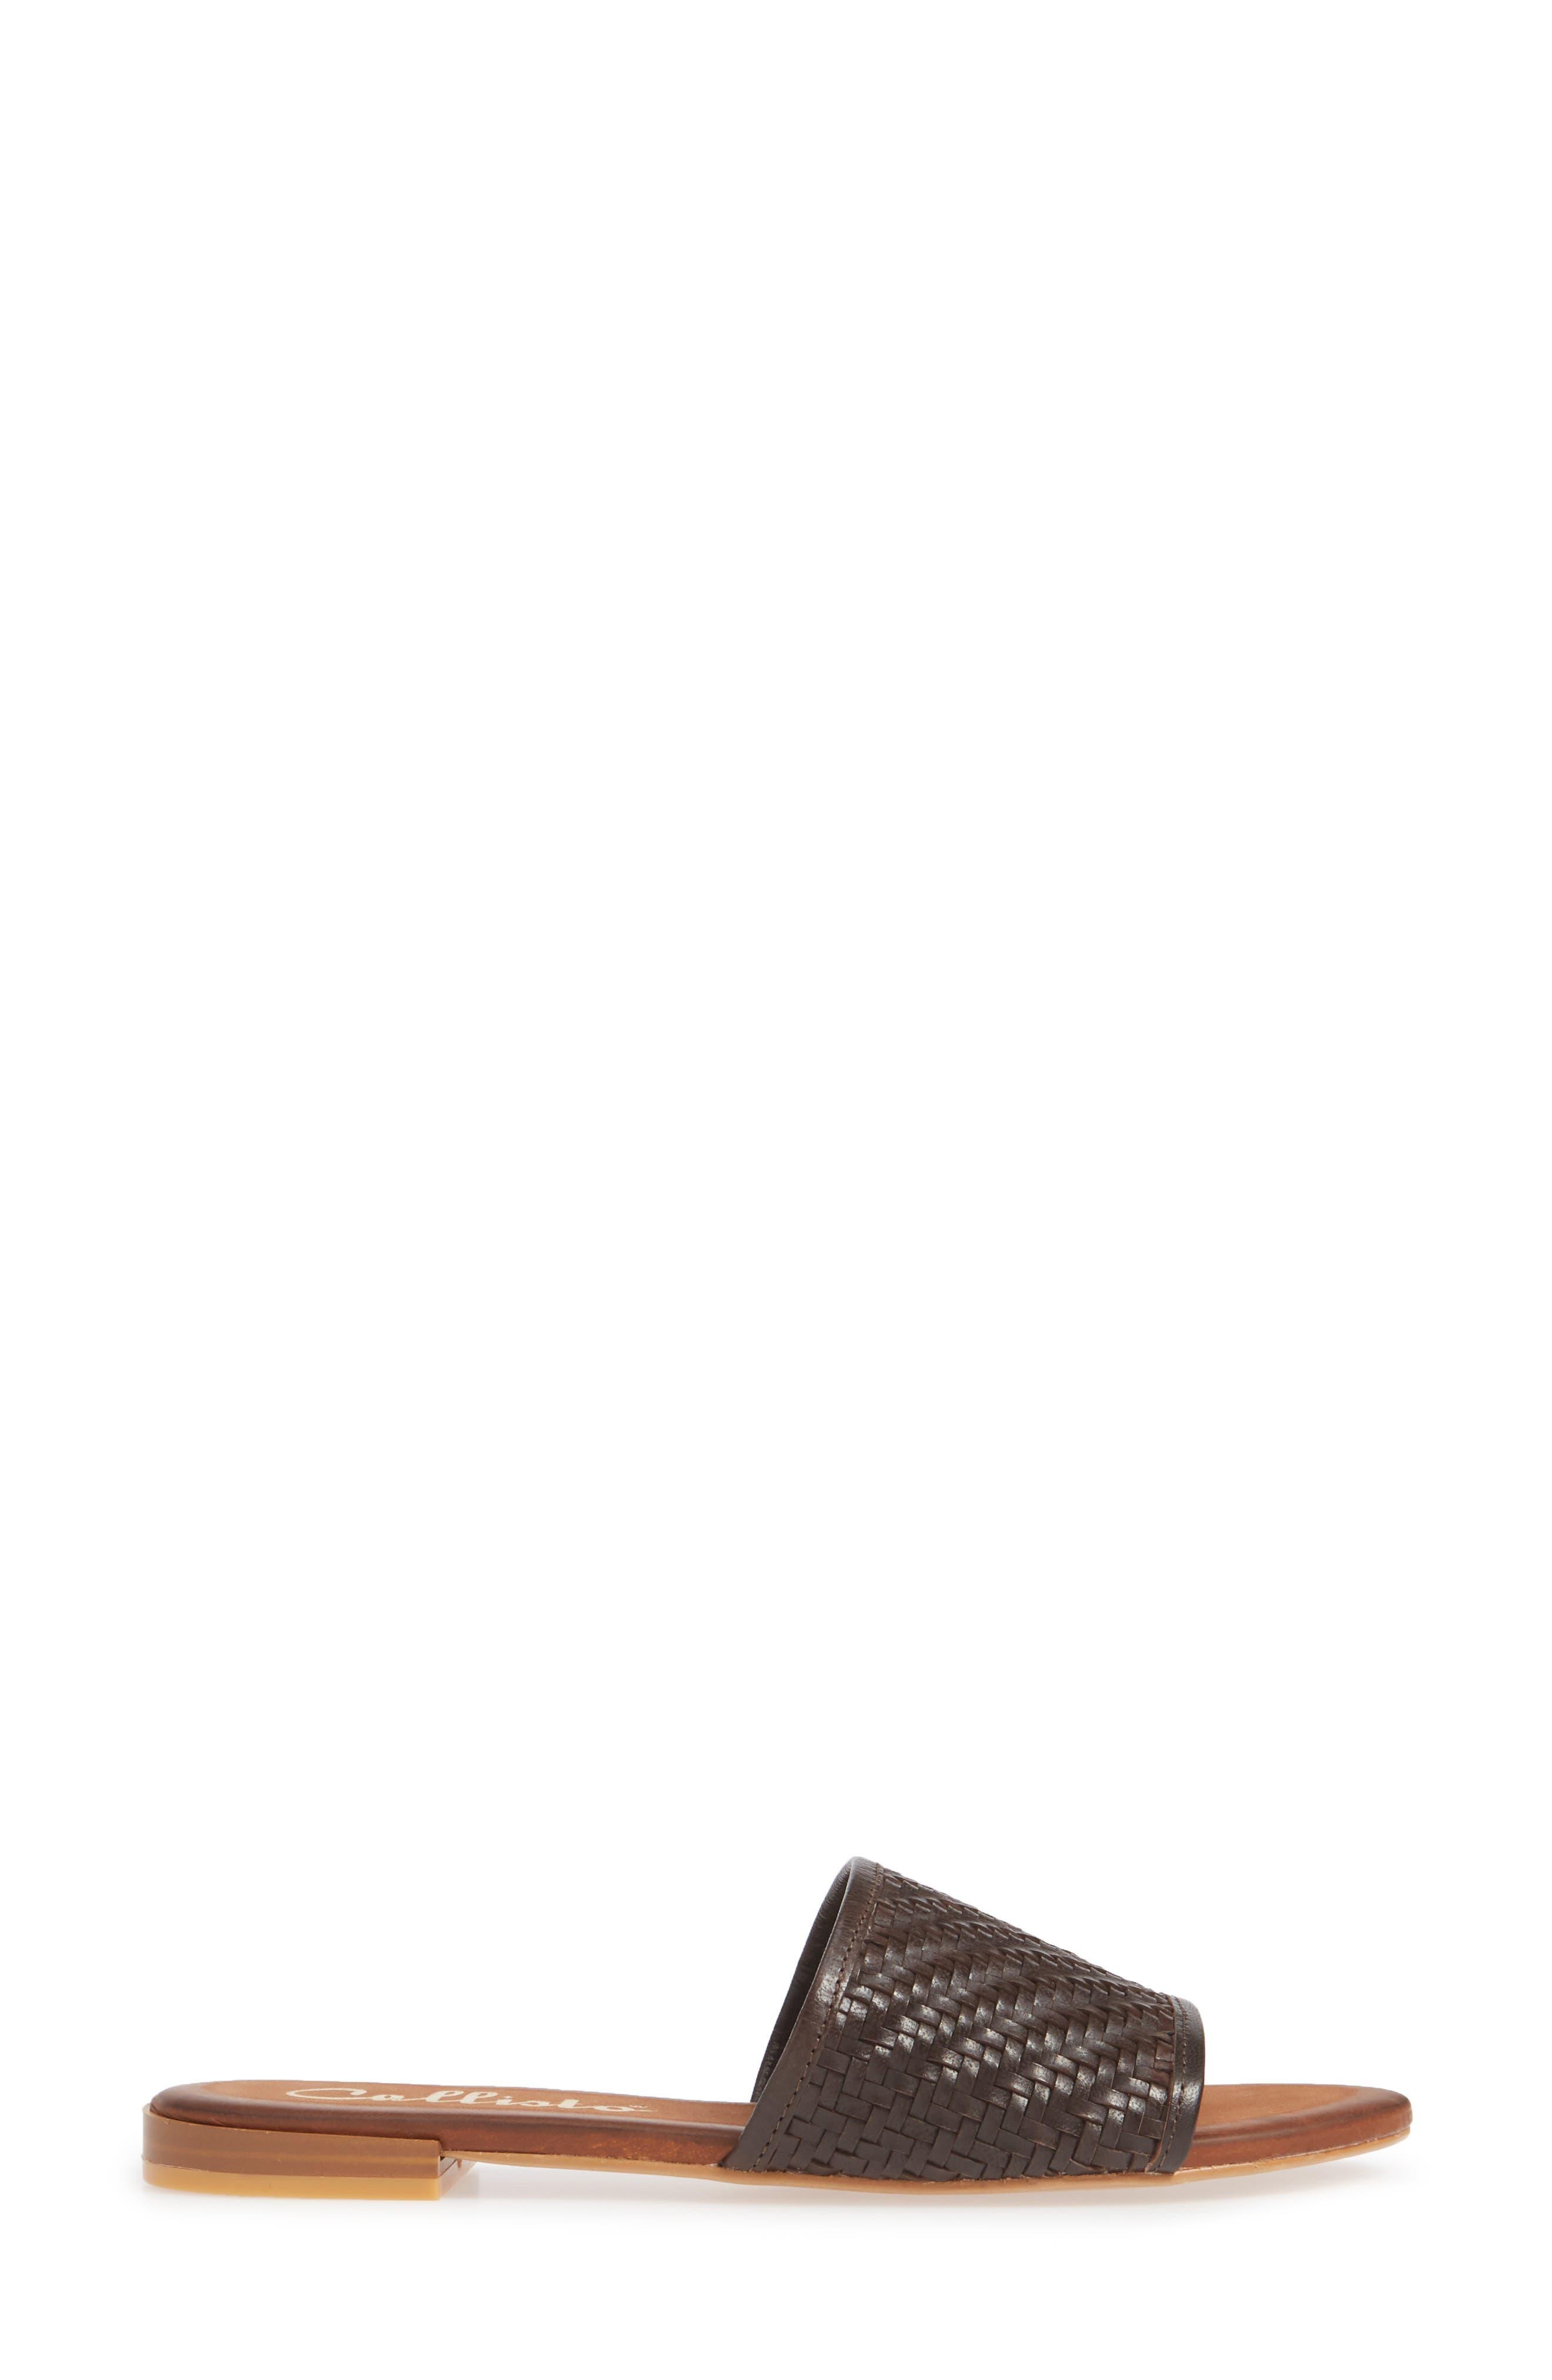 CALLISTO, Thera Woven Slide Sandal, Alternate thumbnail 3, color, BROWN WOVEN LEATHER